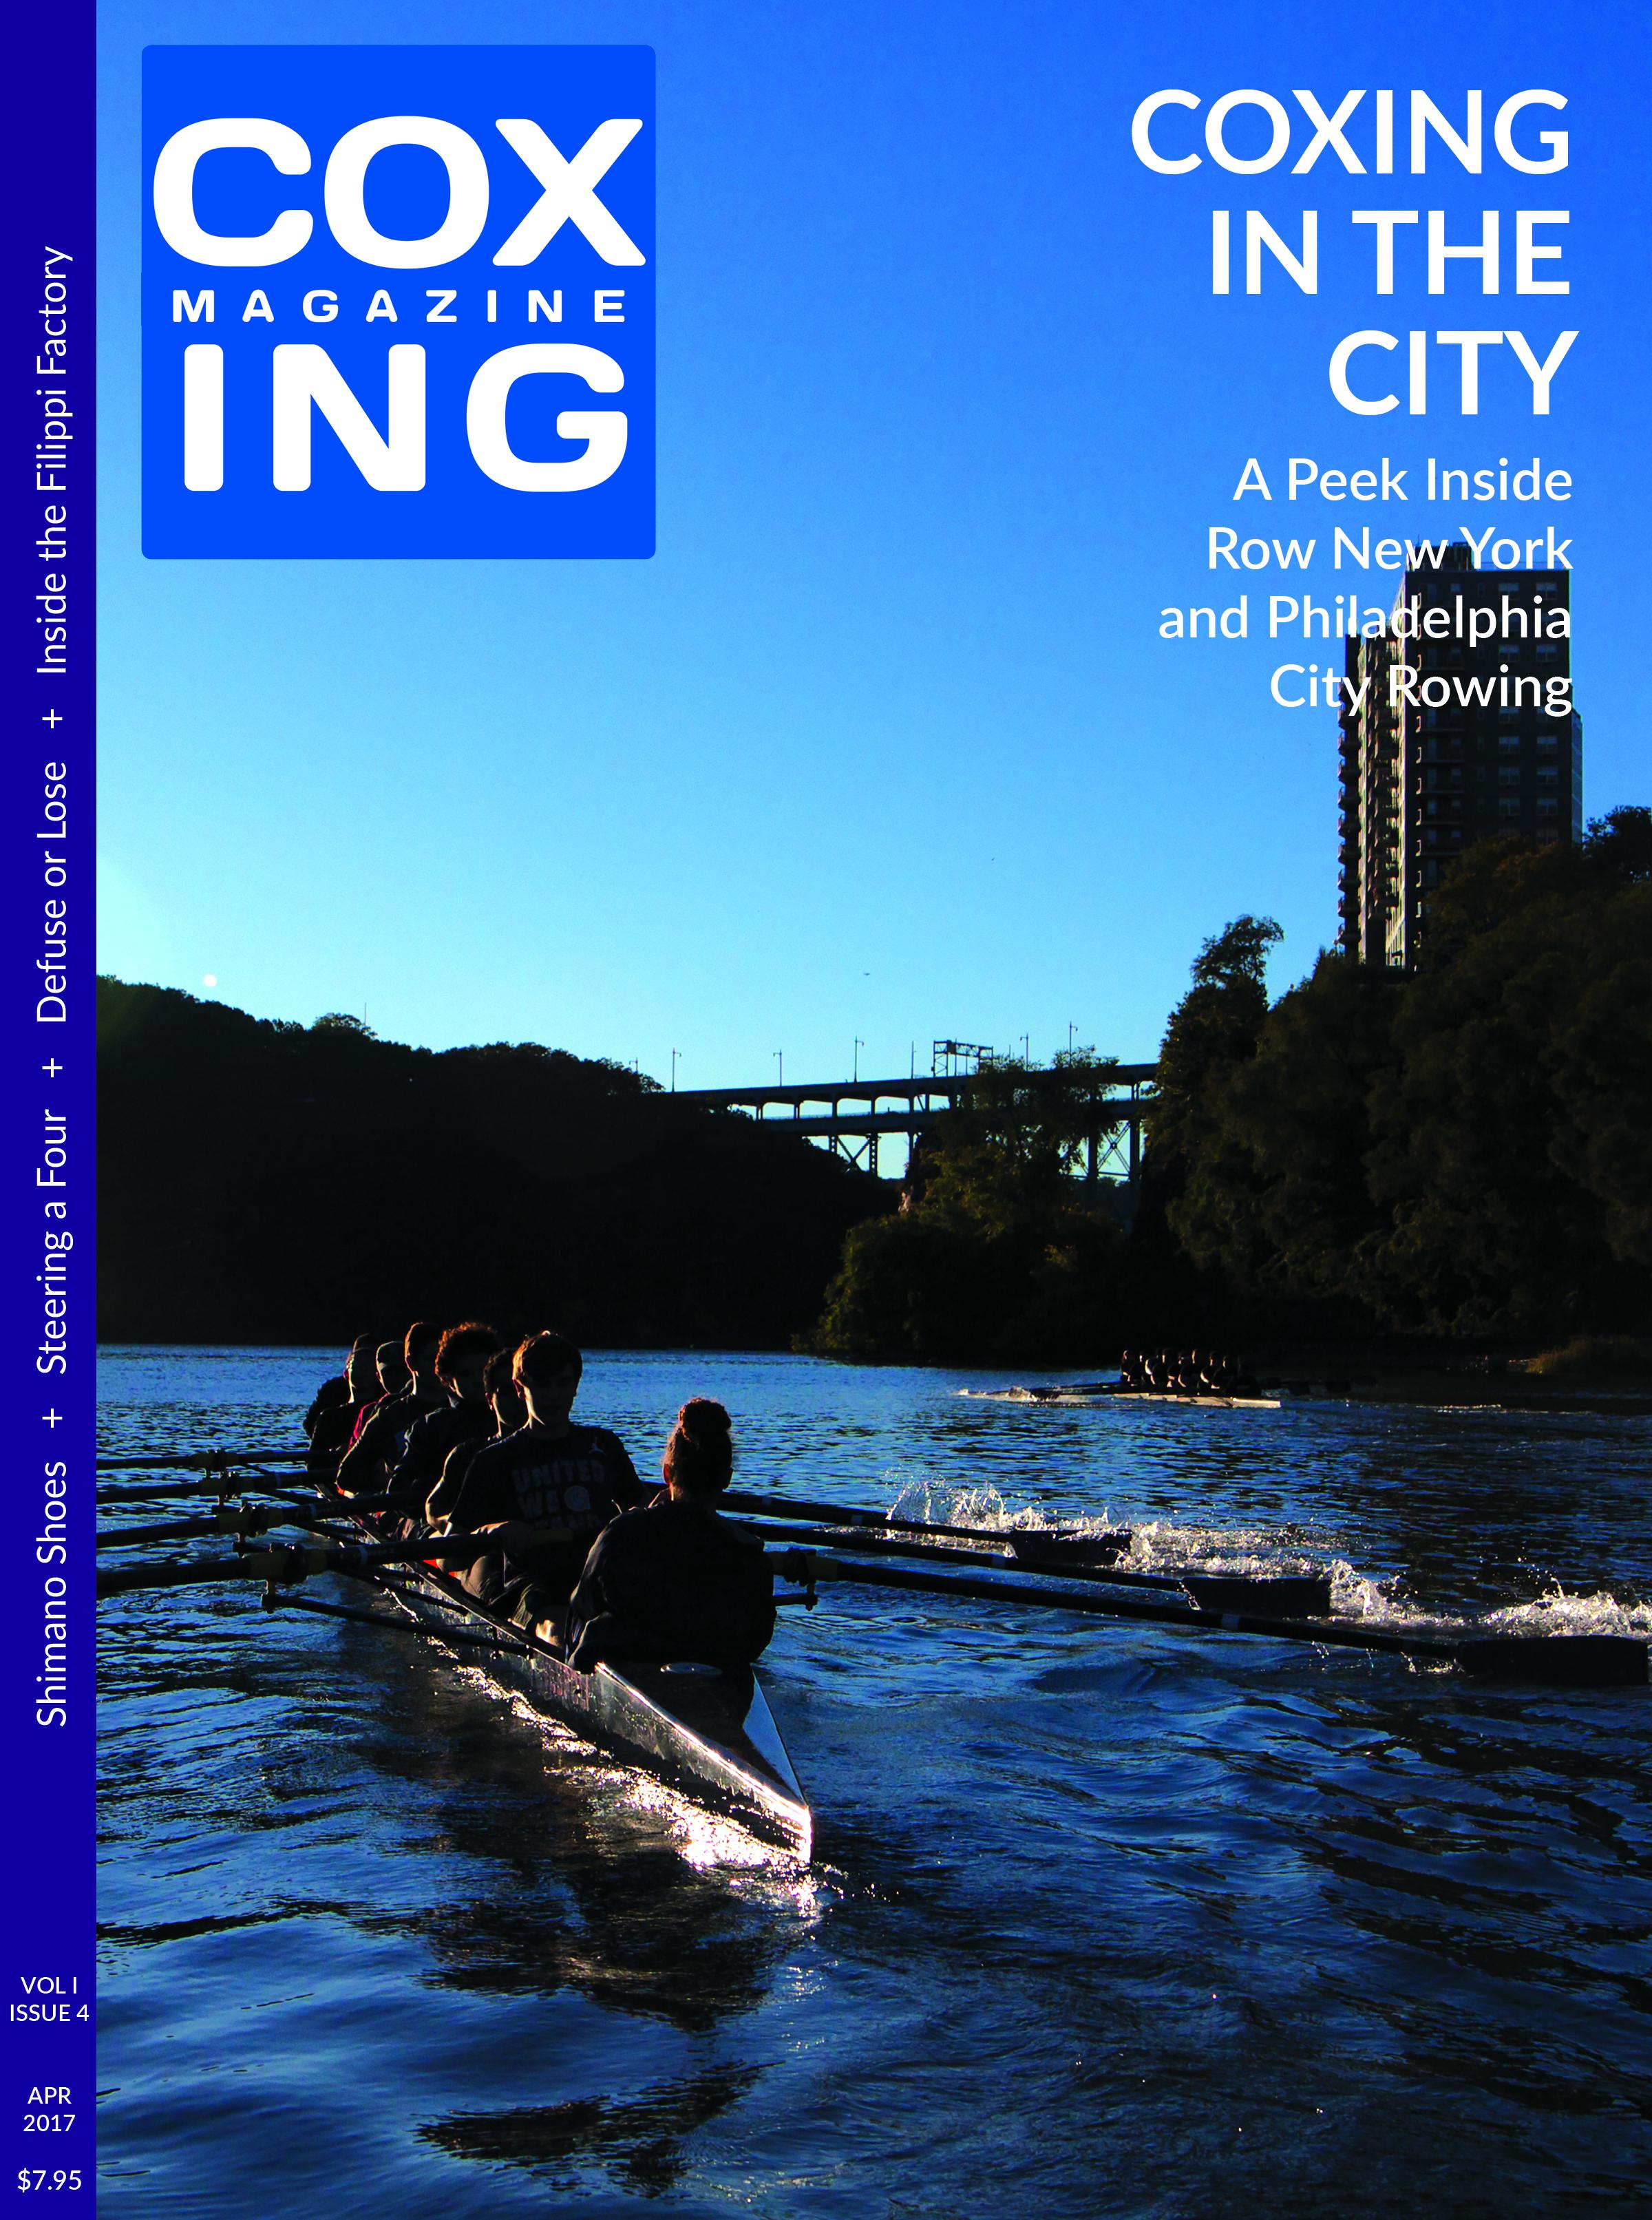 Volume I, Issue 4